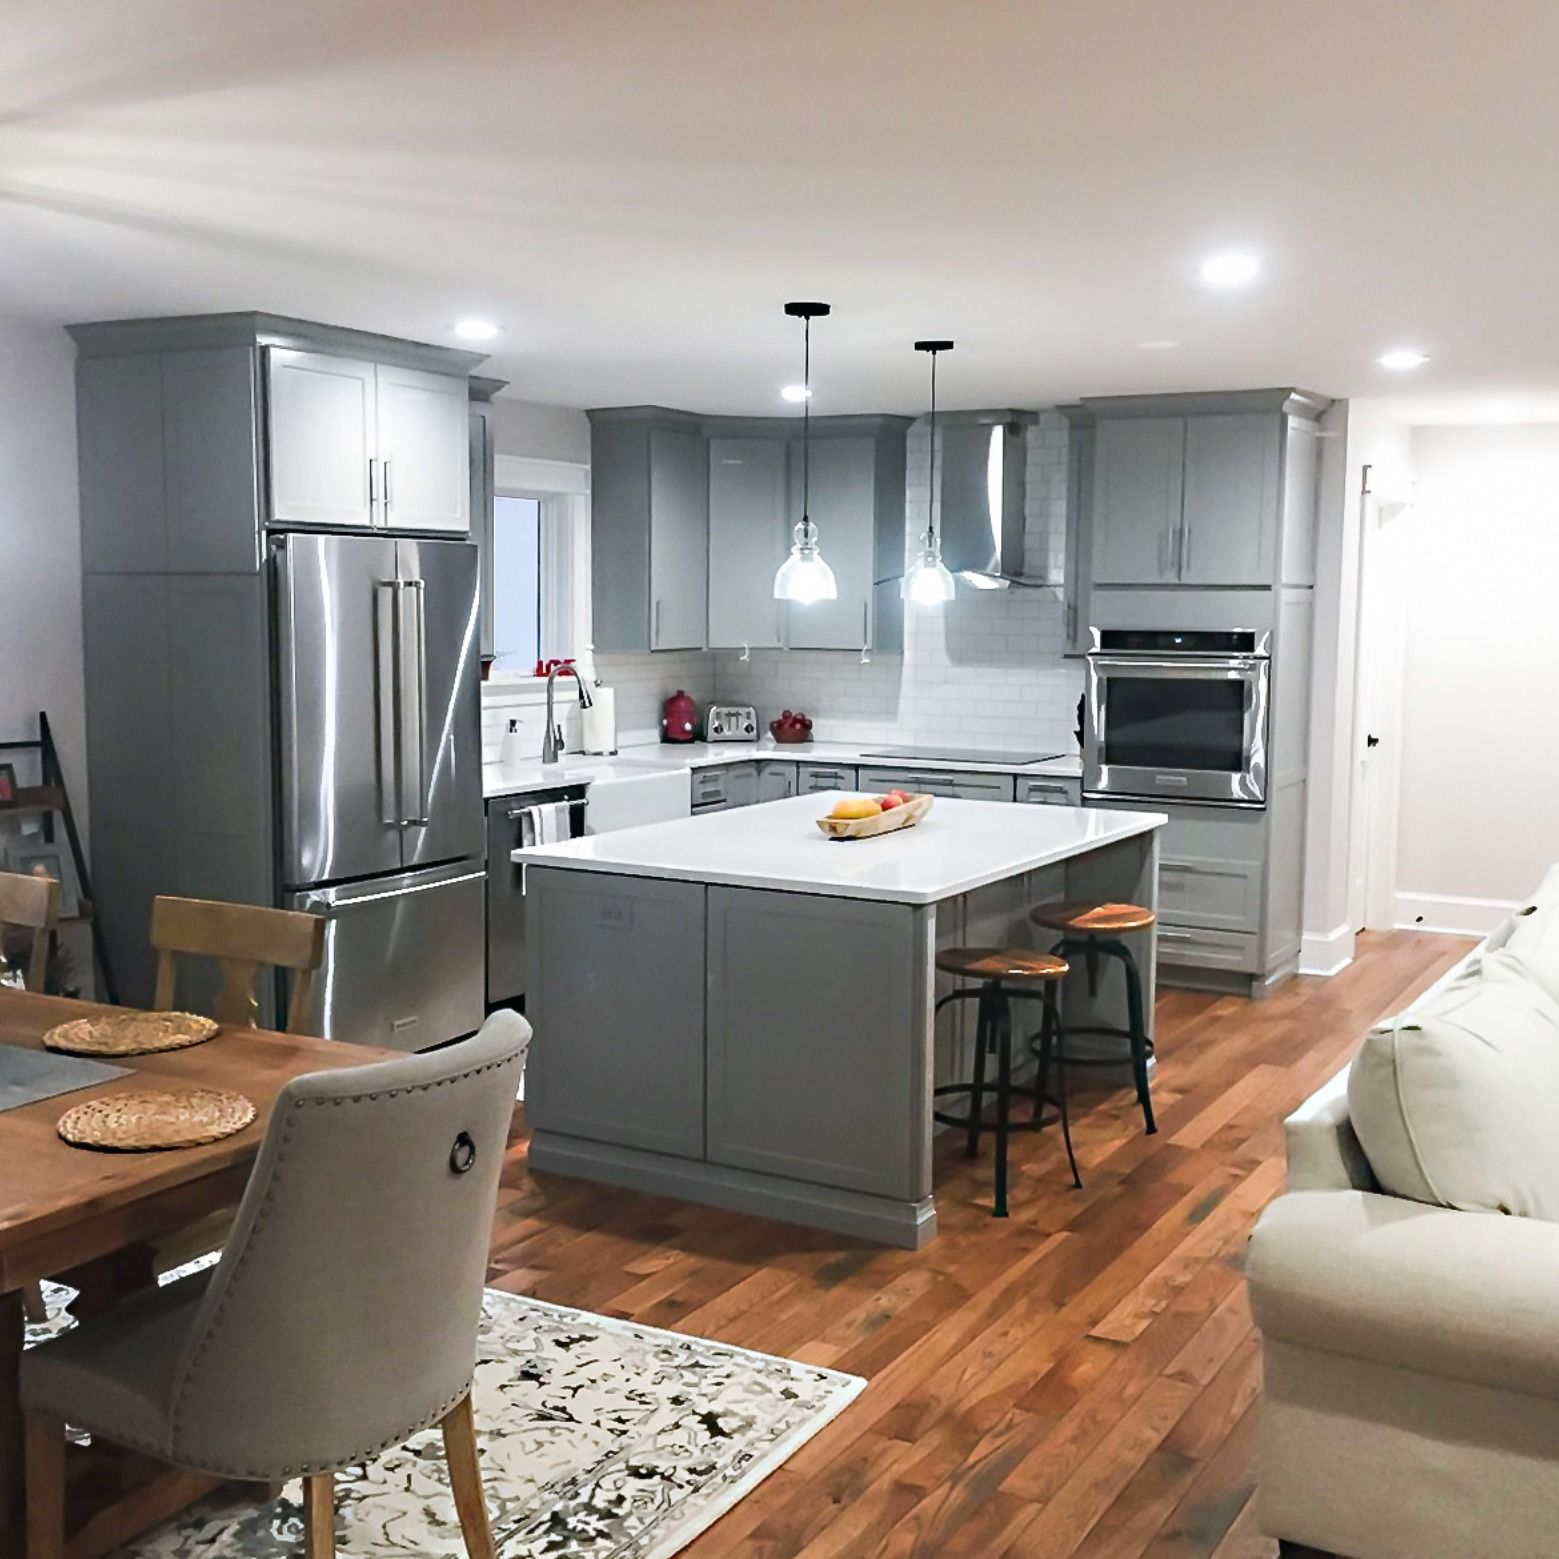 Kemper Echo Gray Kitchen Kitchen Projects Design Kitchen Redesign Free Kitchen Design